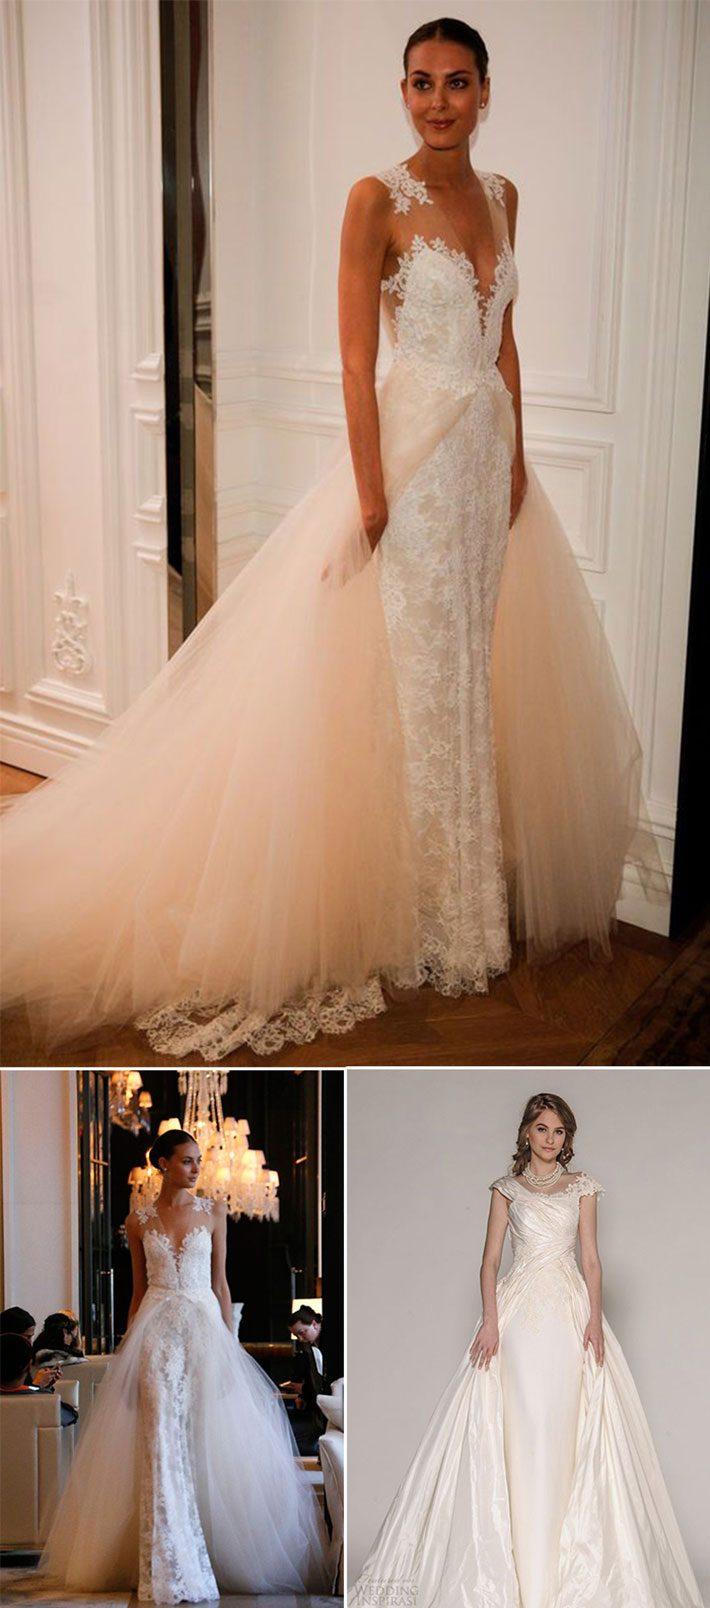 Tendência para vestidos de noiva 2016 | 2017